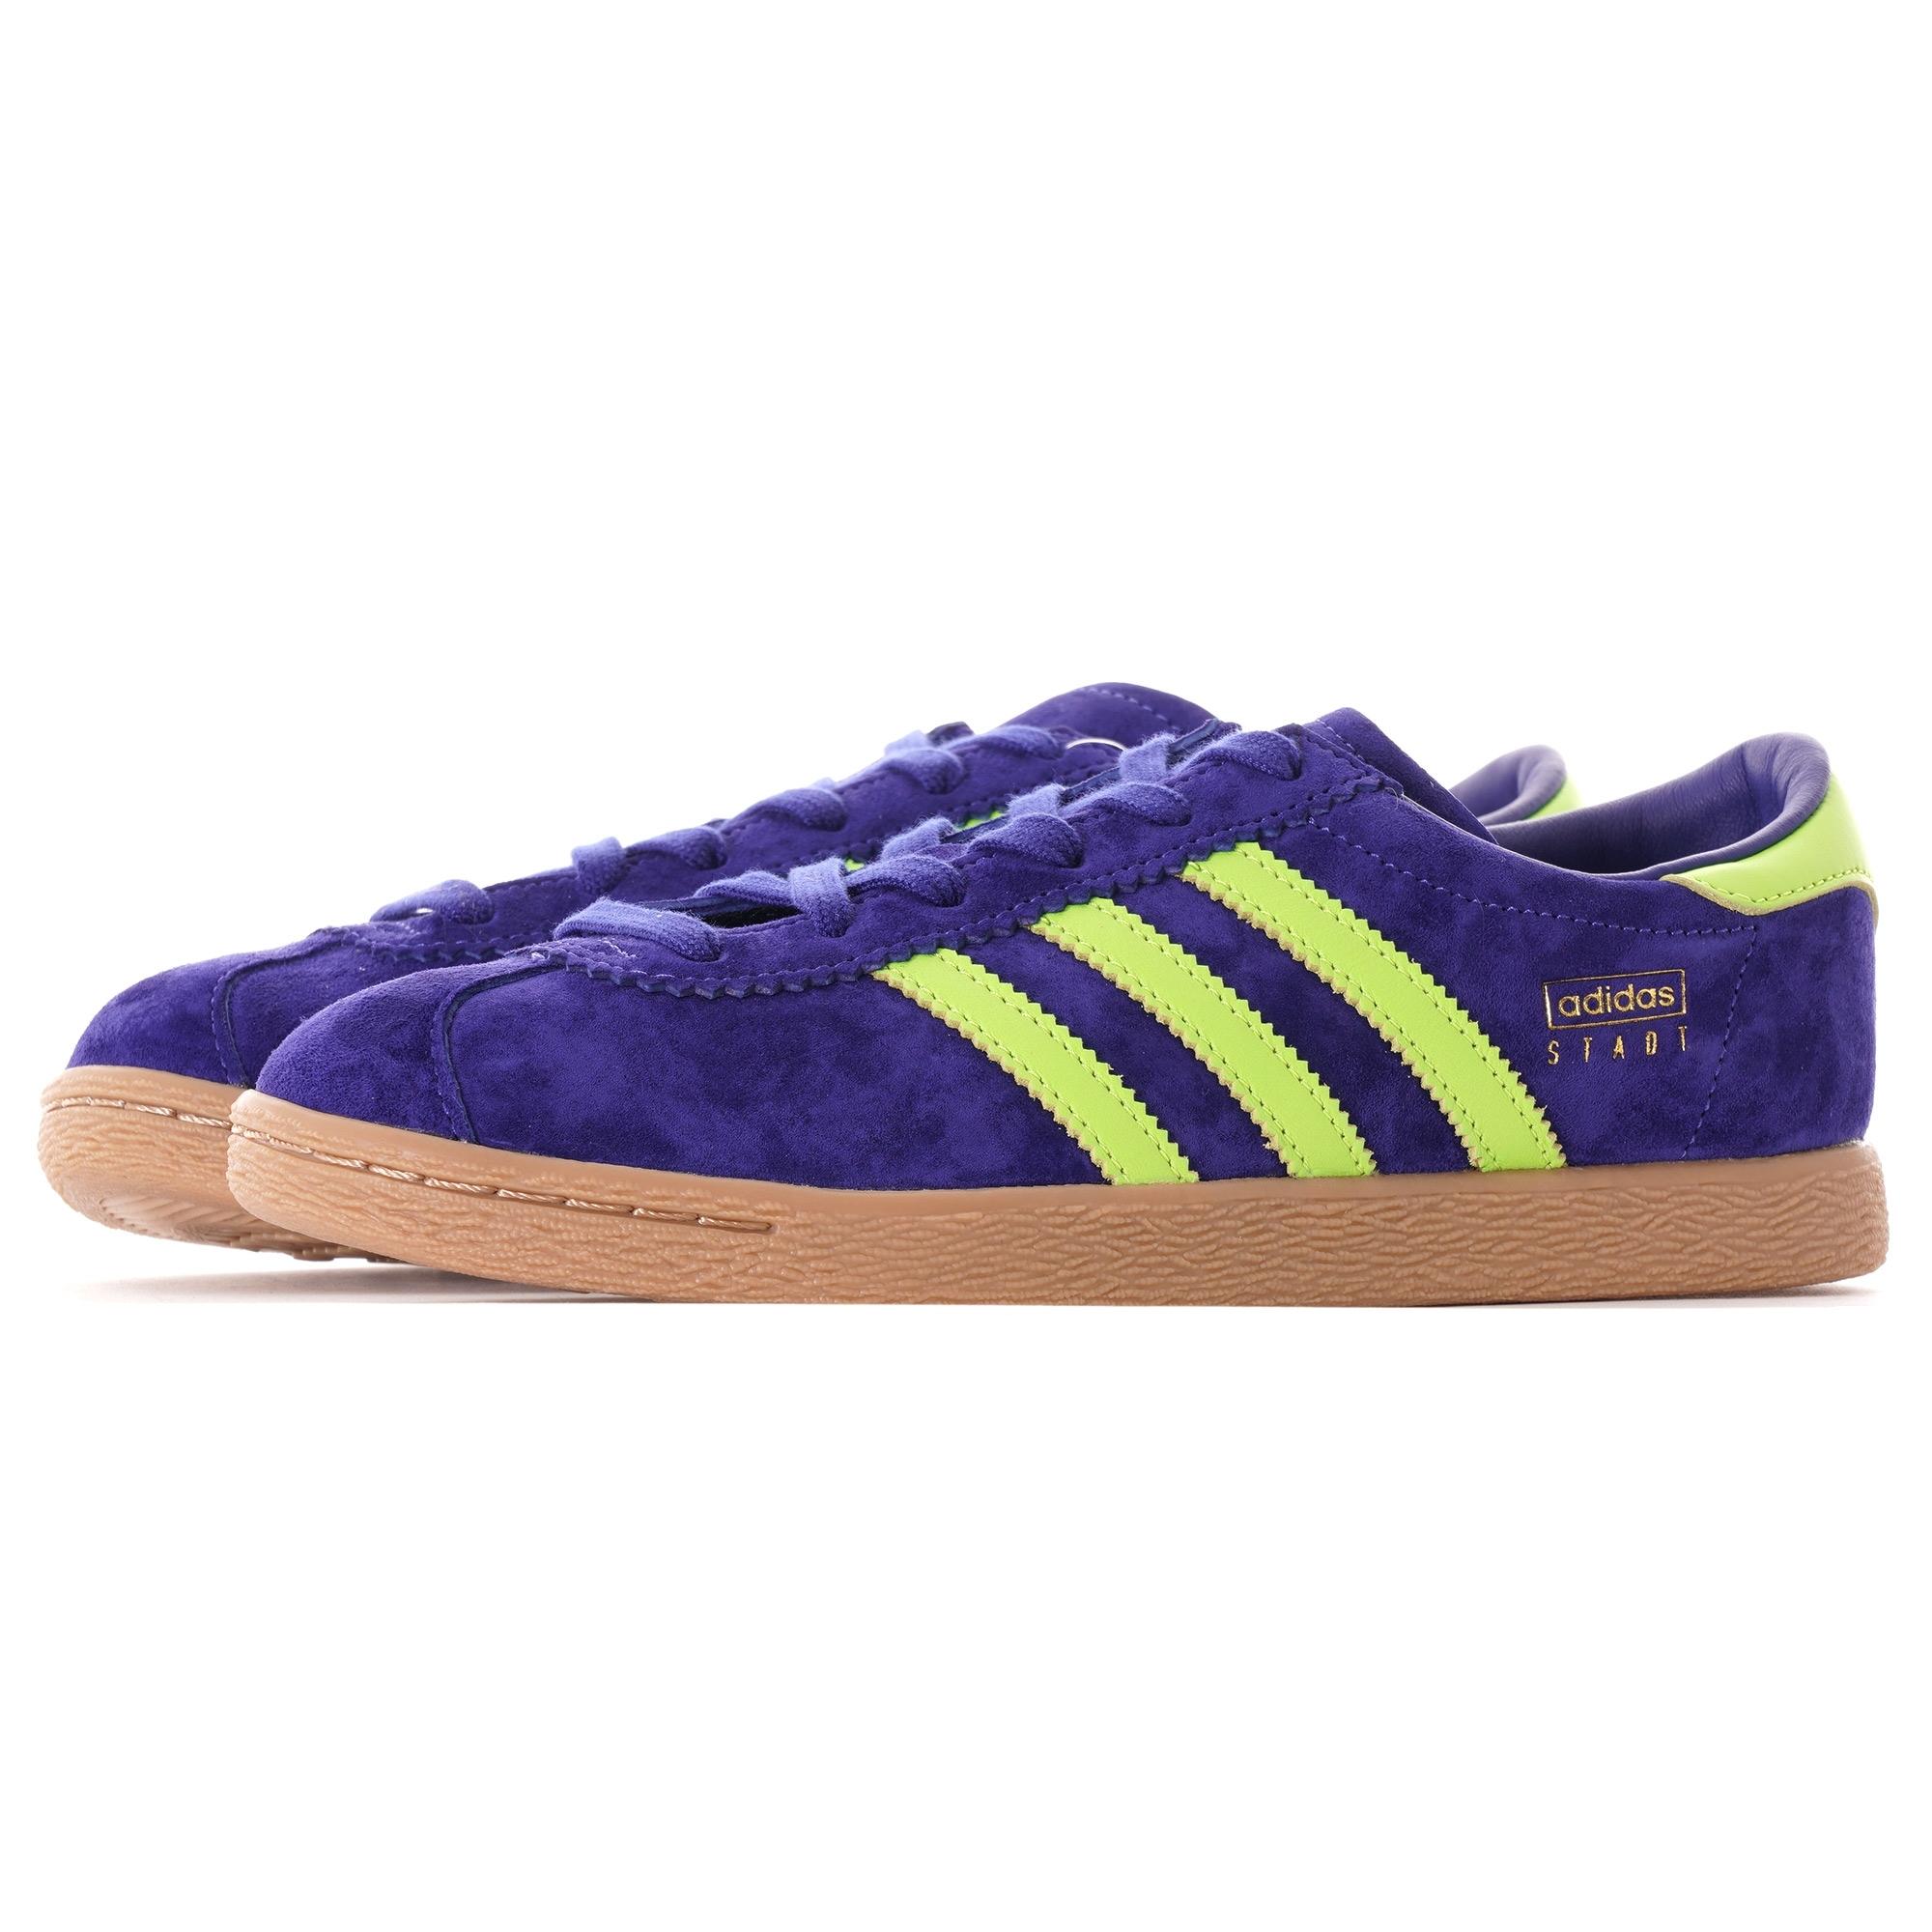 Adidas Originals stadt trainers both colourways £59.47 + £3.95 delivery Stuarts London